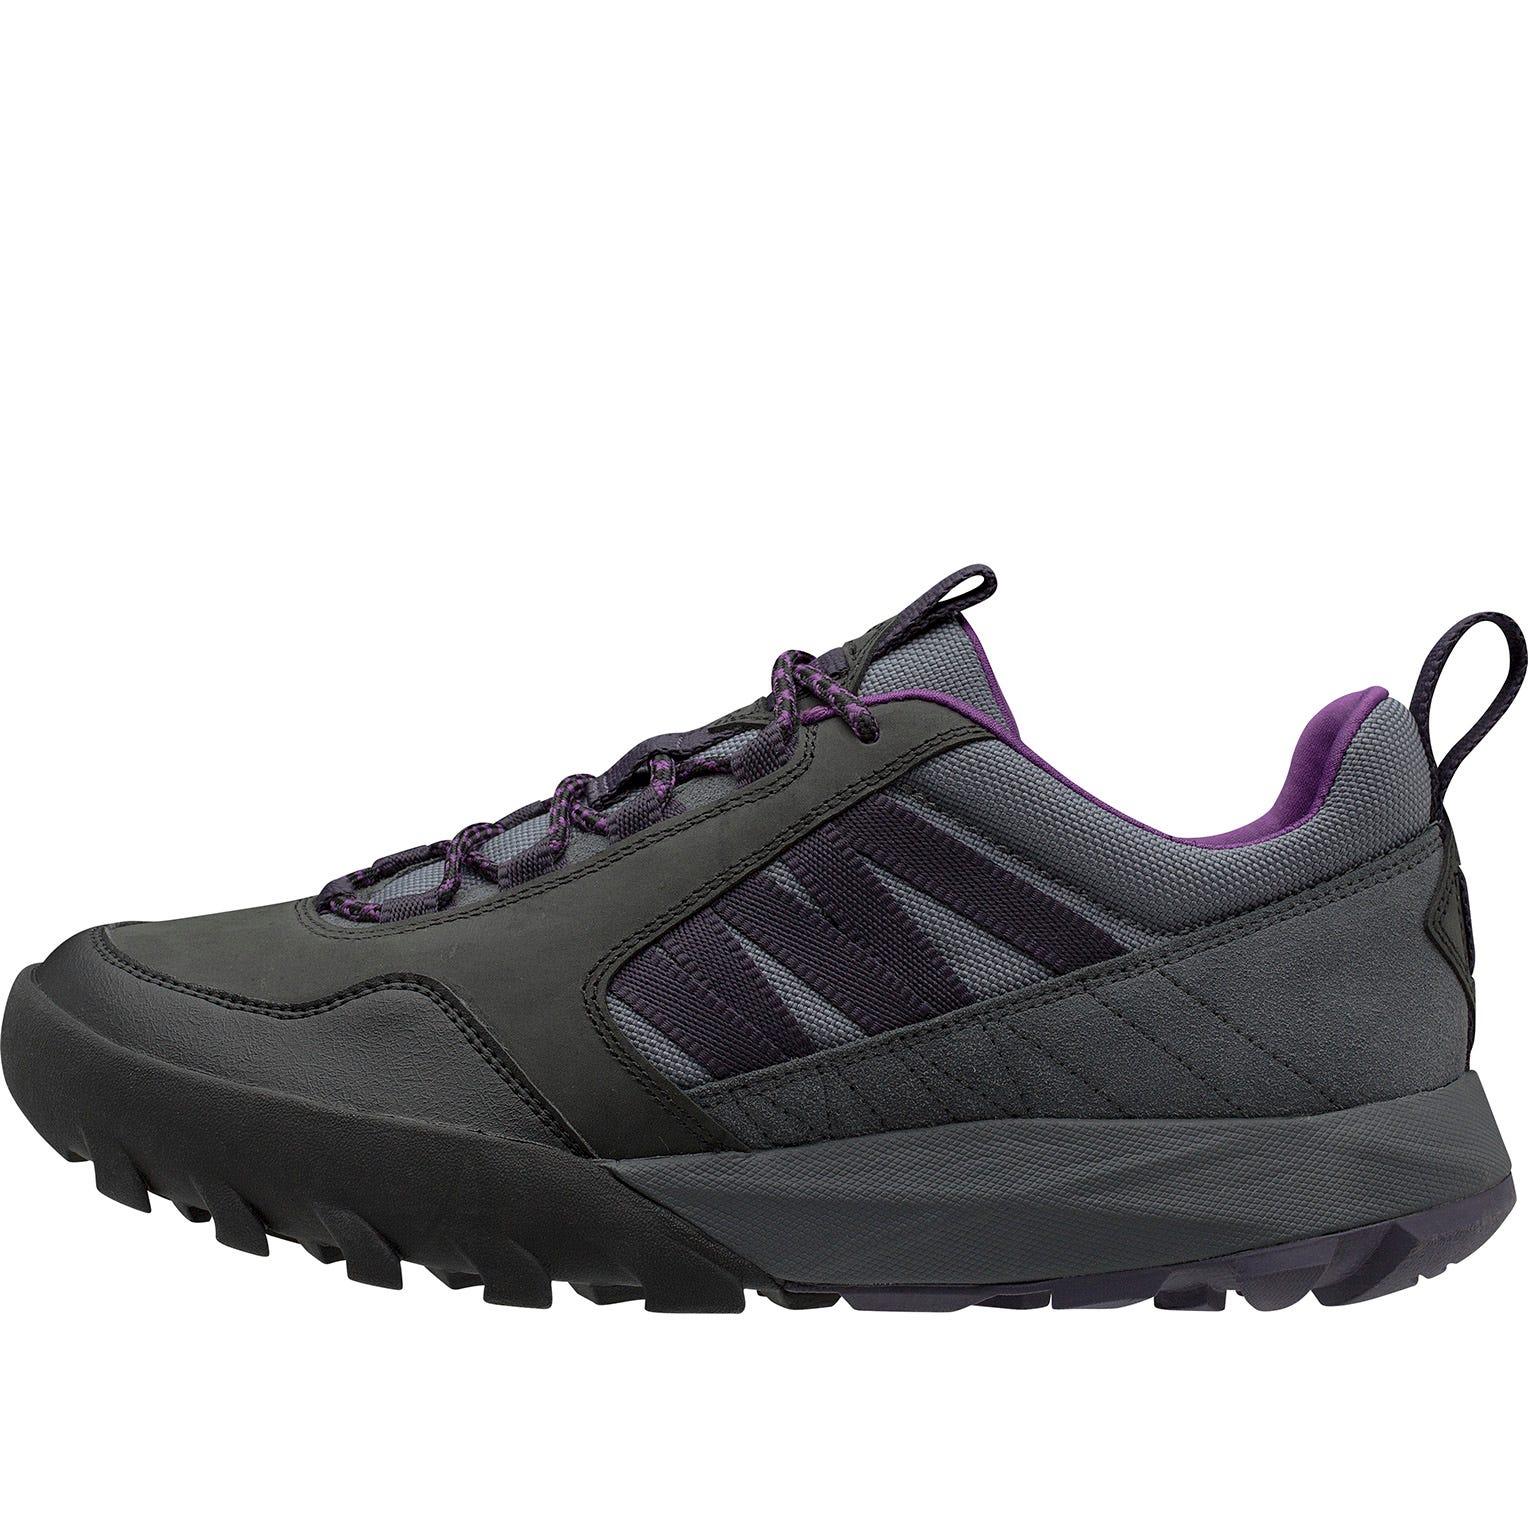 Helly Hansen W Loke Bowron Leather Womens Hiking Boot Black 40/8.5